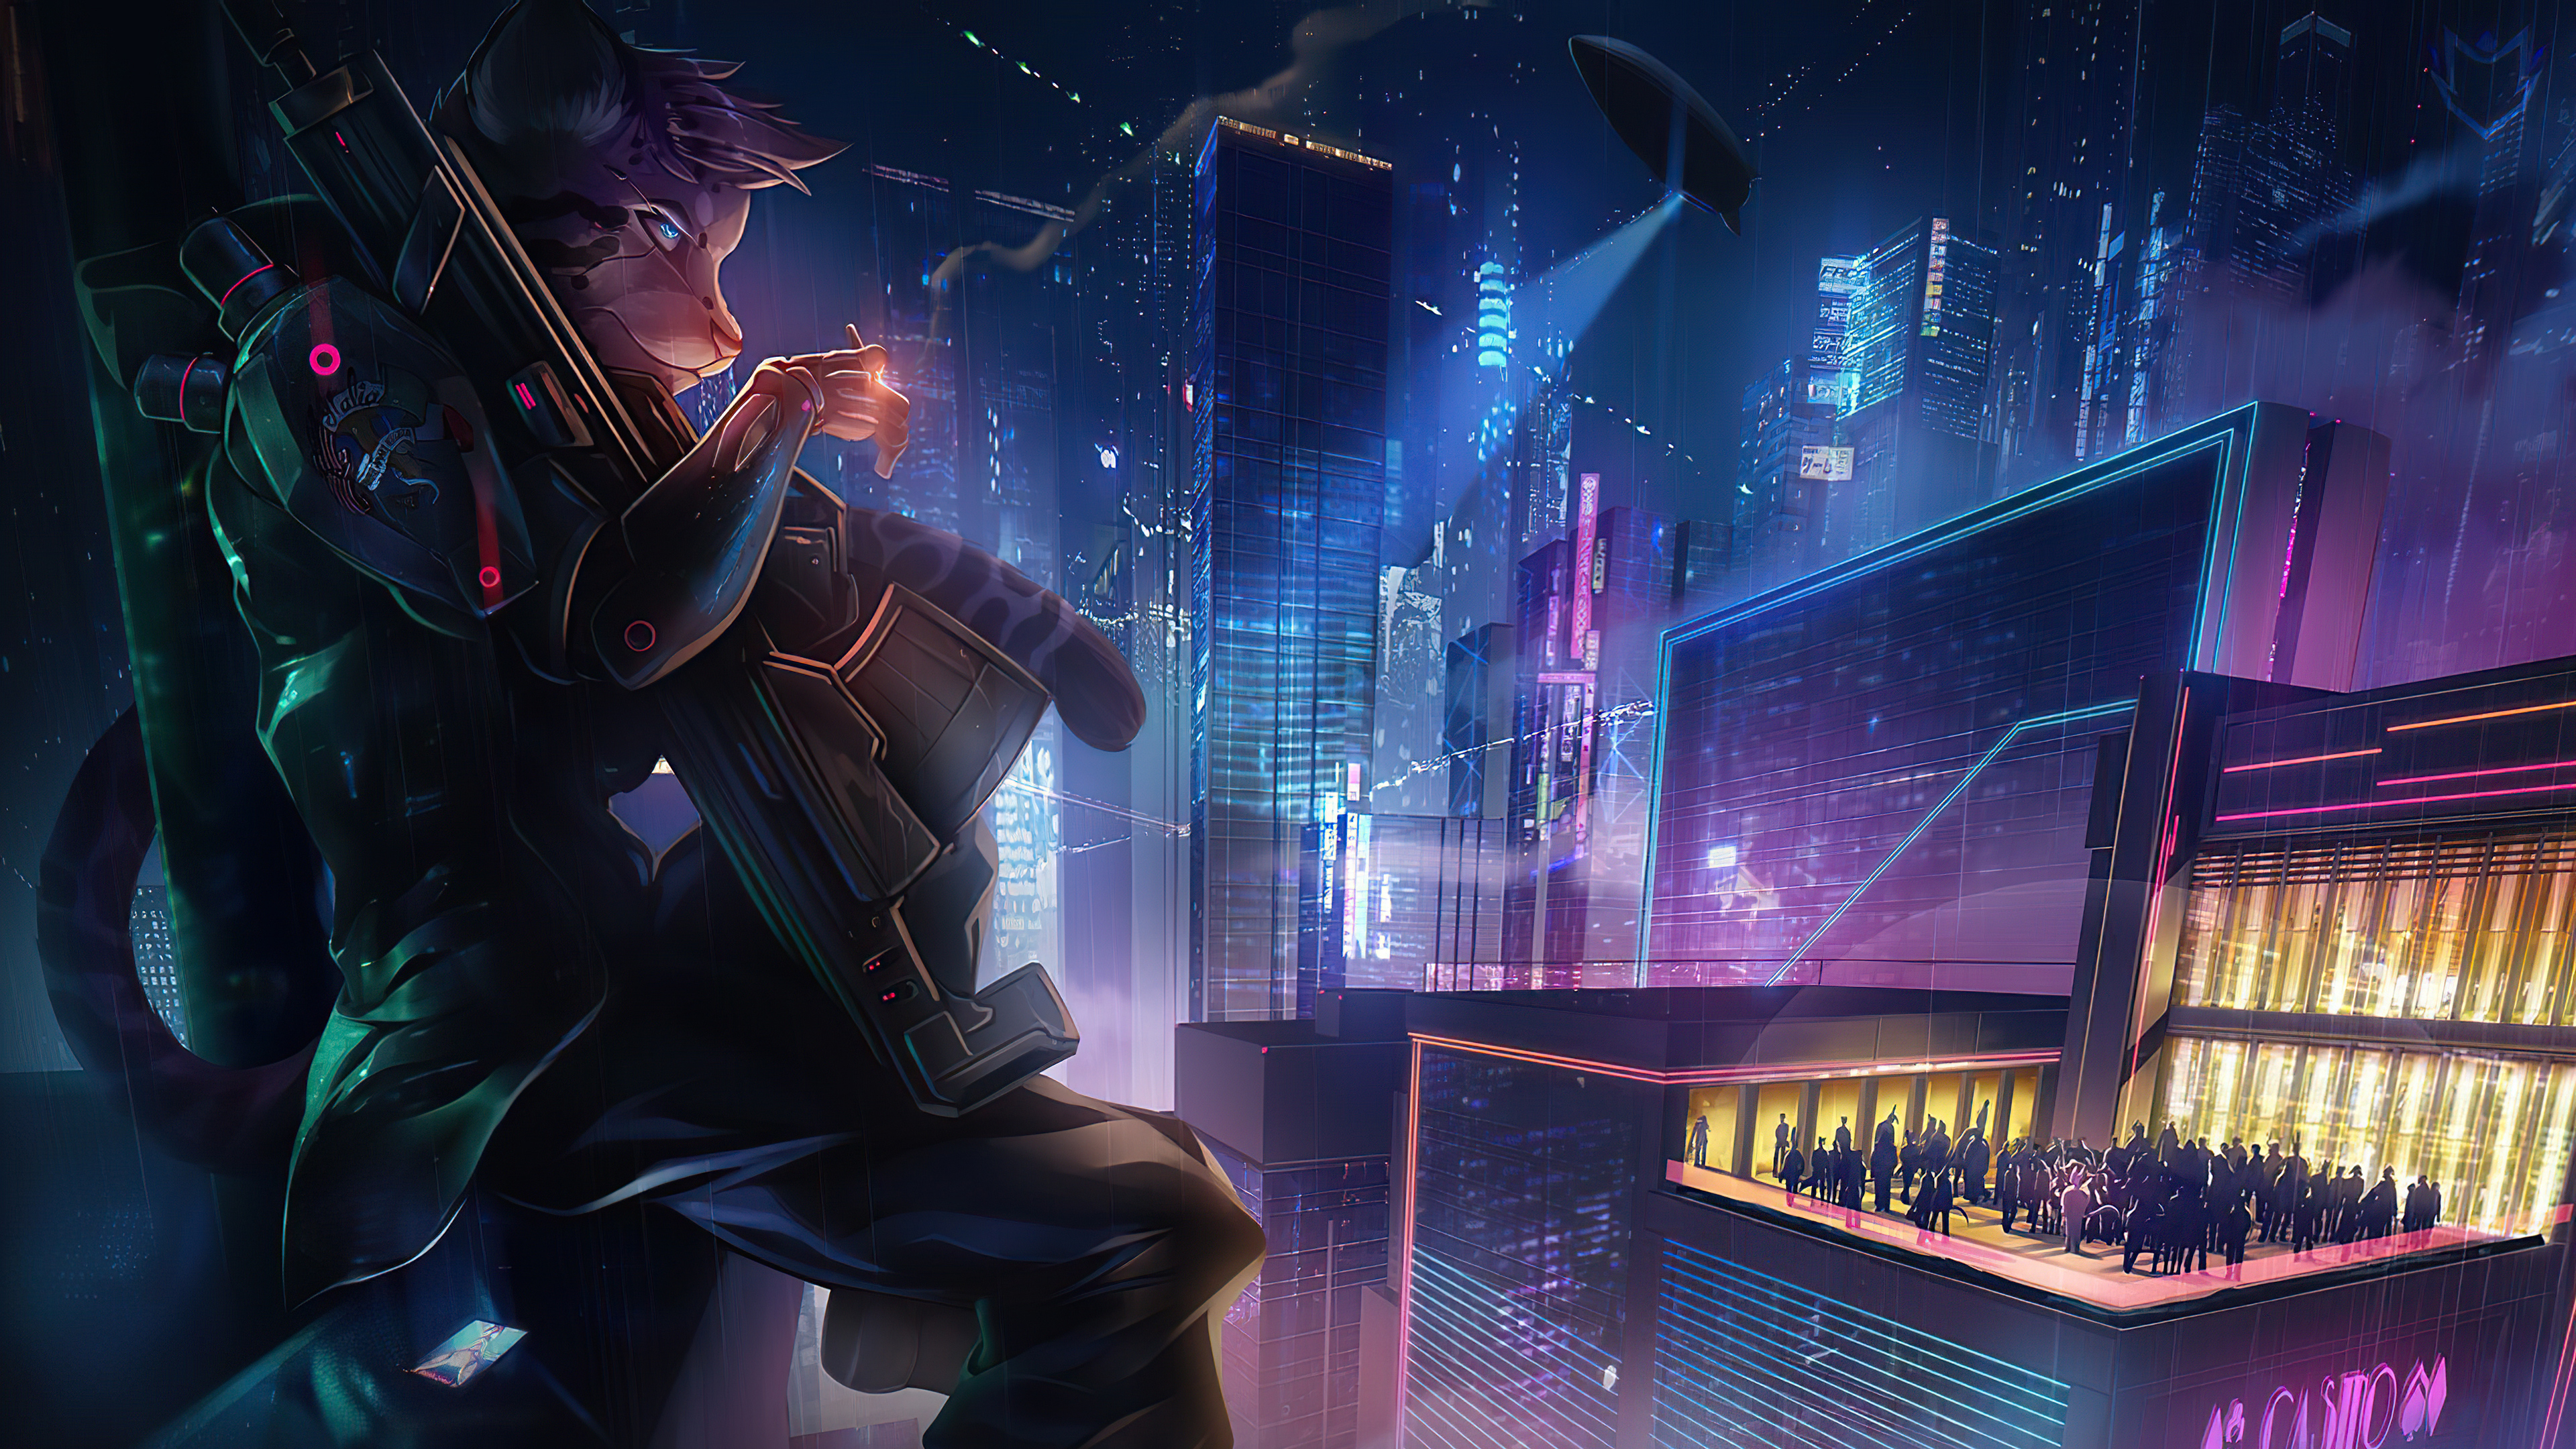 3840x2160 New 2020 Cyberpunk Artwork 4K Wallpaper, HD ...